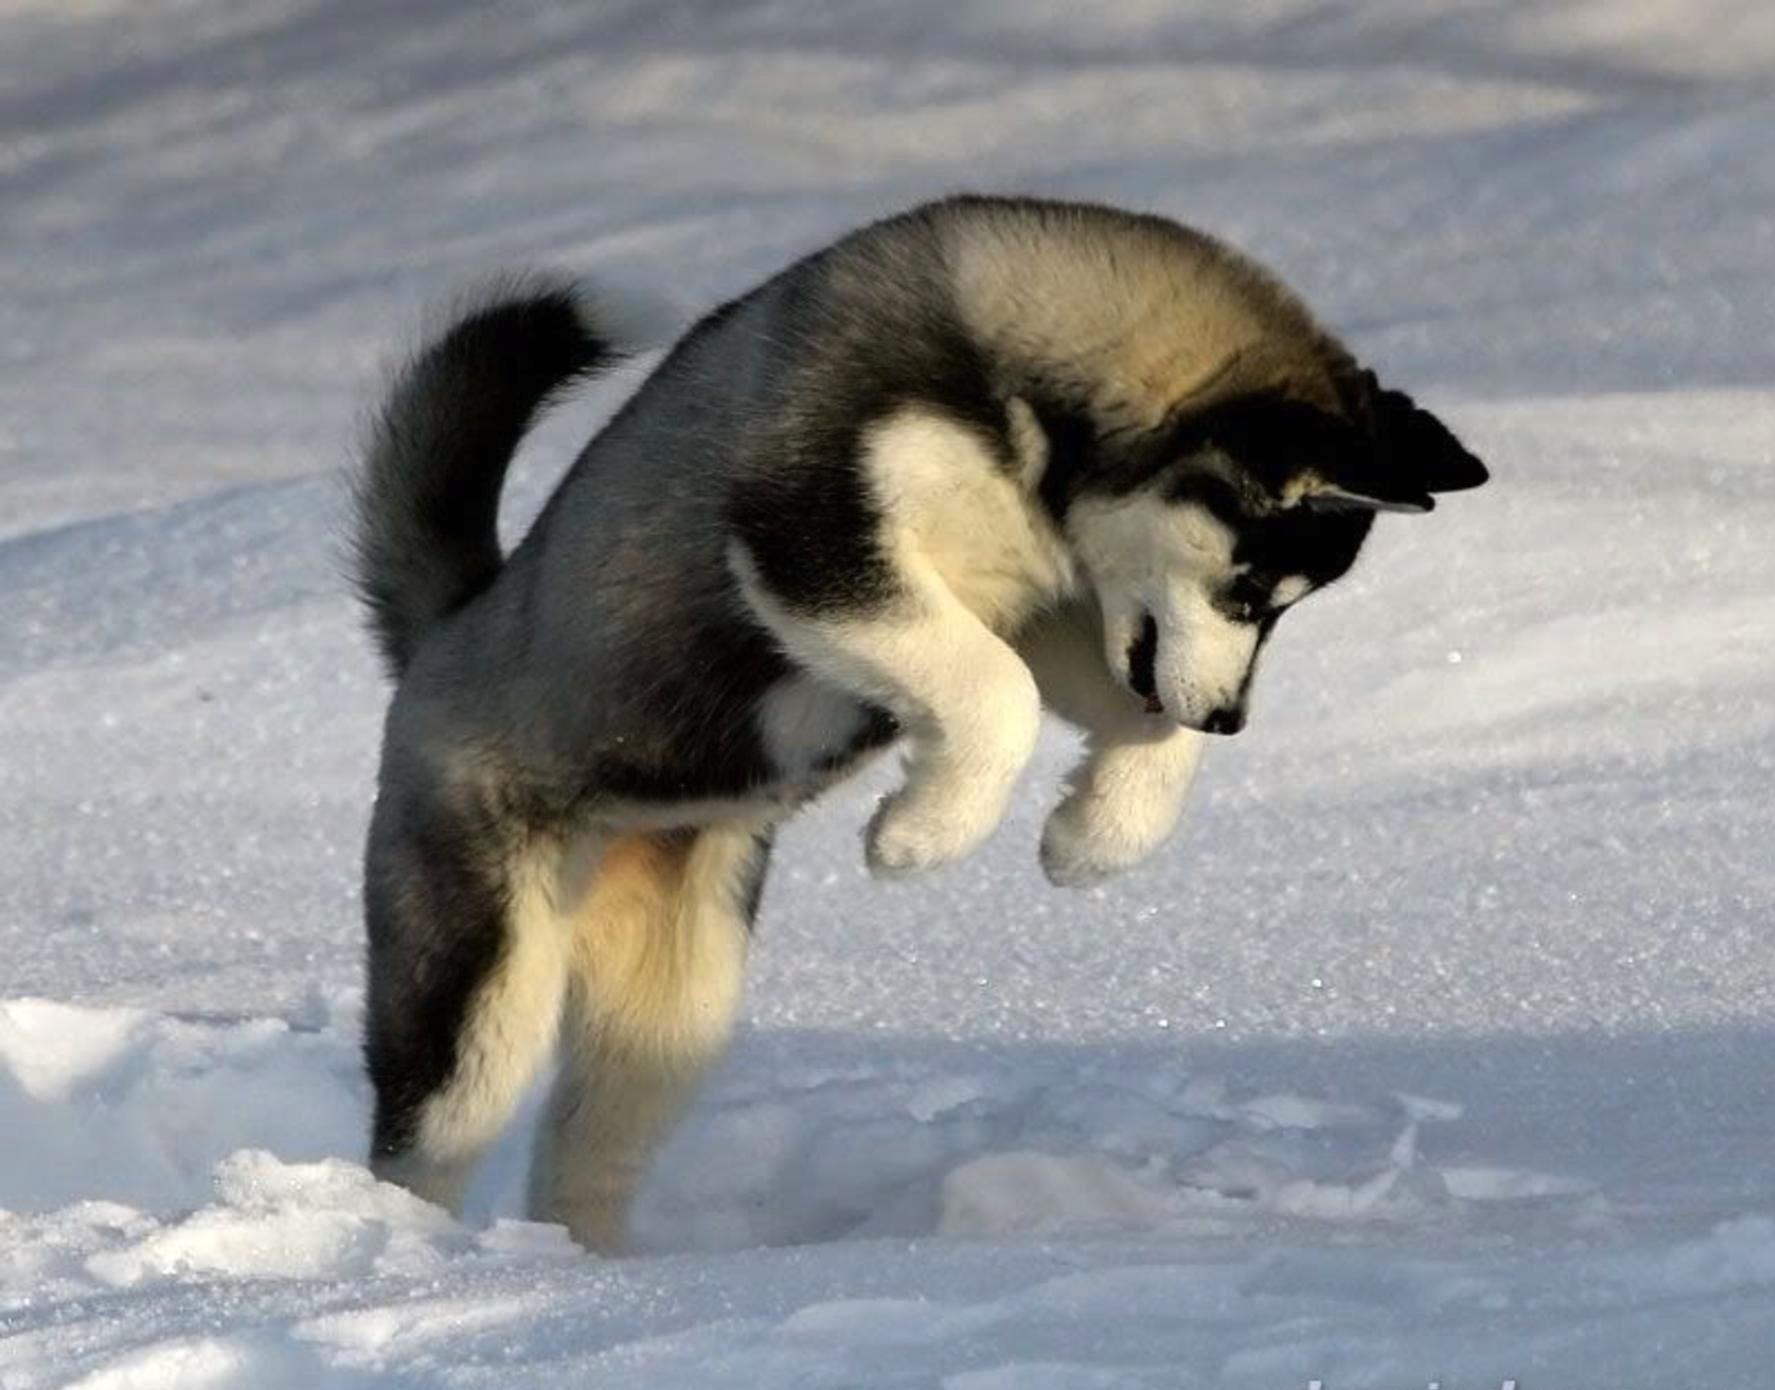 Jumping Husky | Husky Problems.com